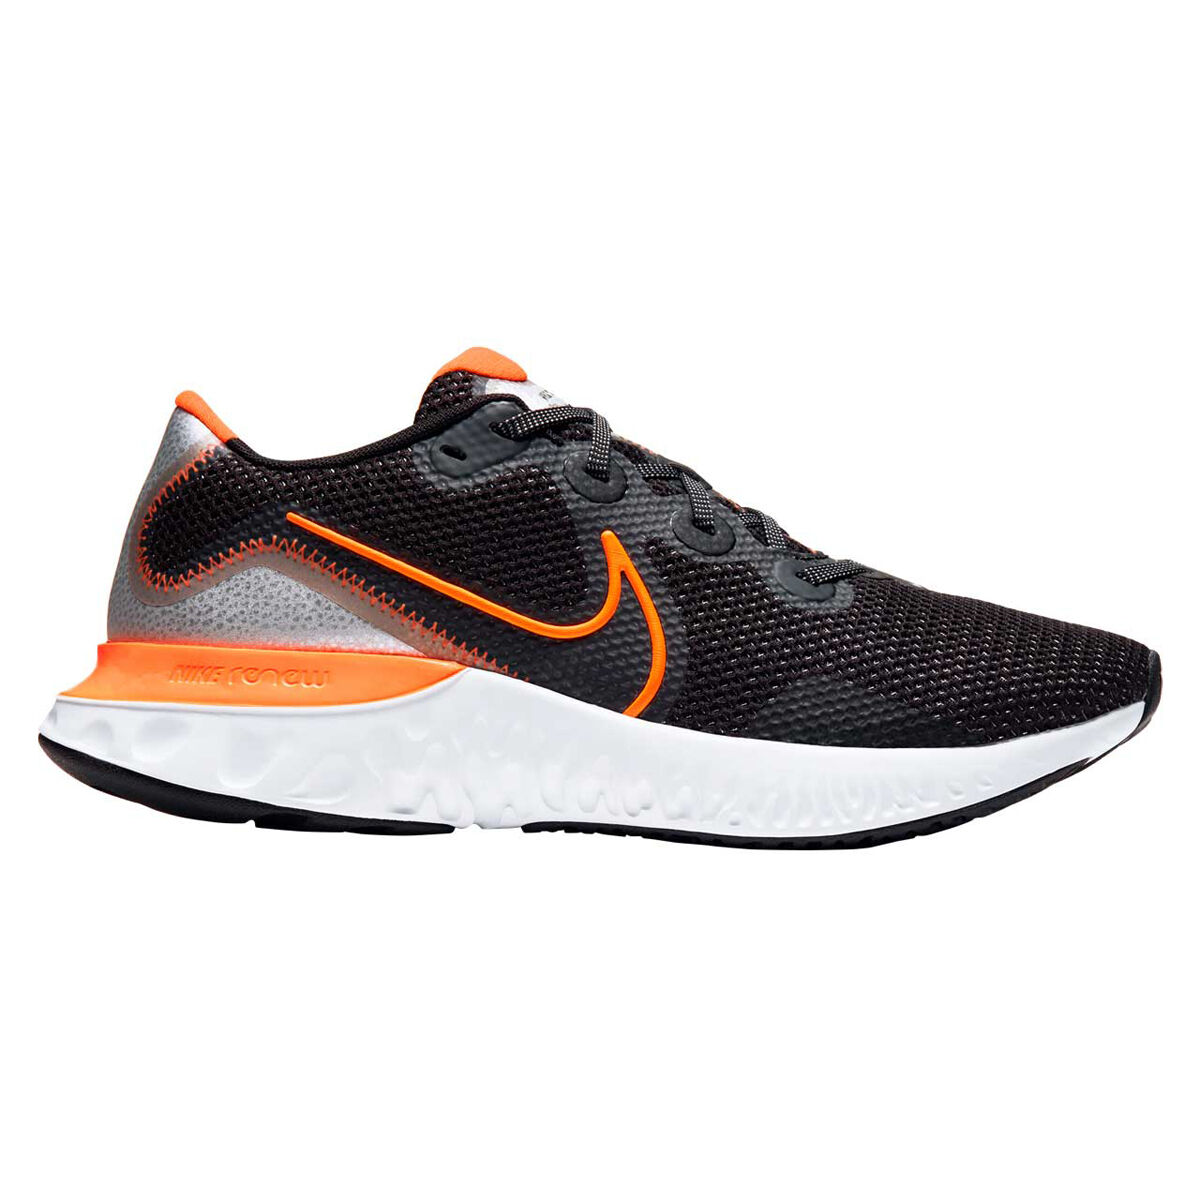 Nike Renew Run Mens Running Shoes